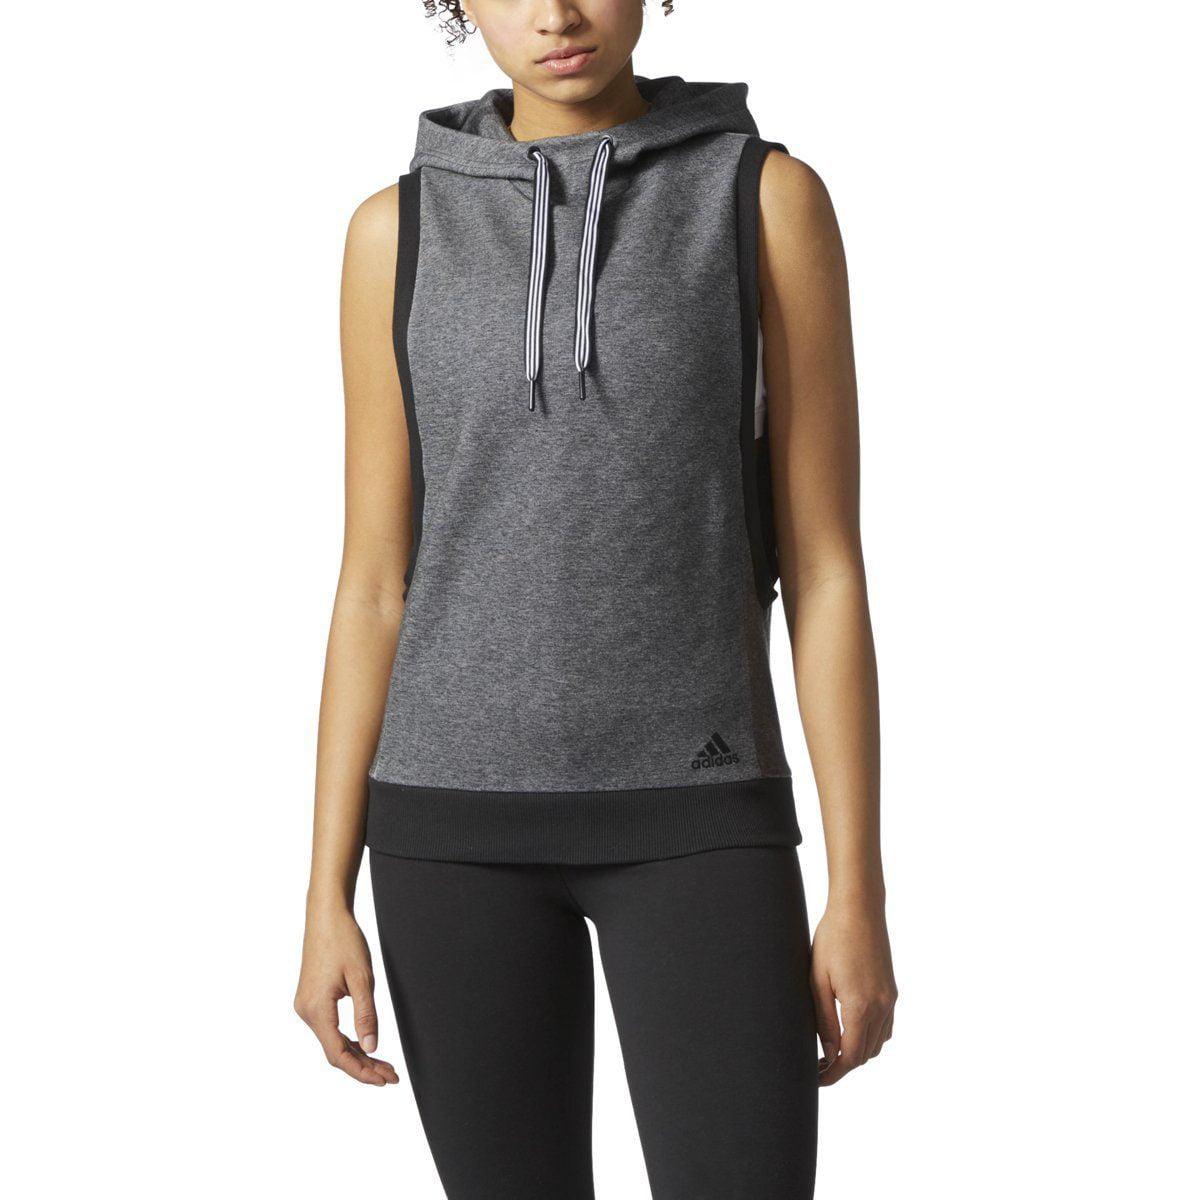 e58a7fe47 adidas - adidas Women's Athletics Sport Id Sleeveless Hoodie | CF0480 -  Walmart.com